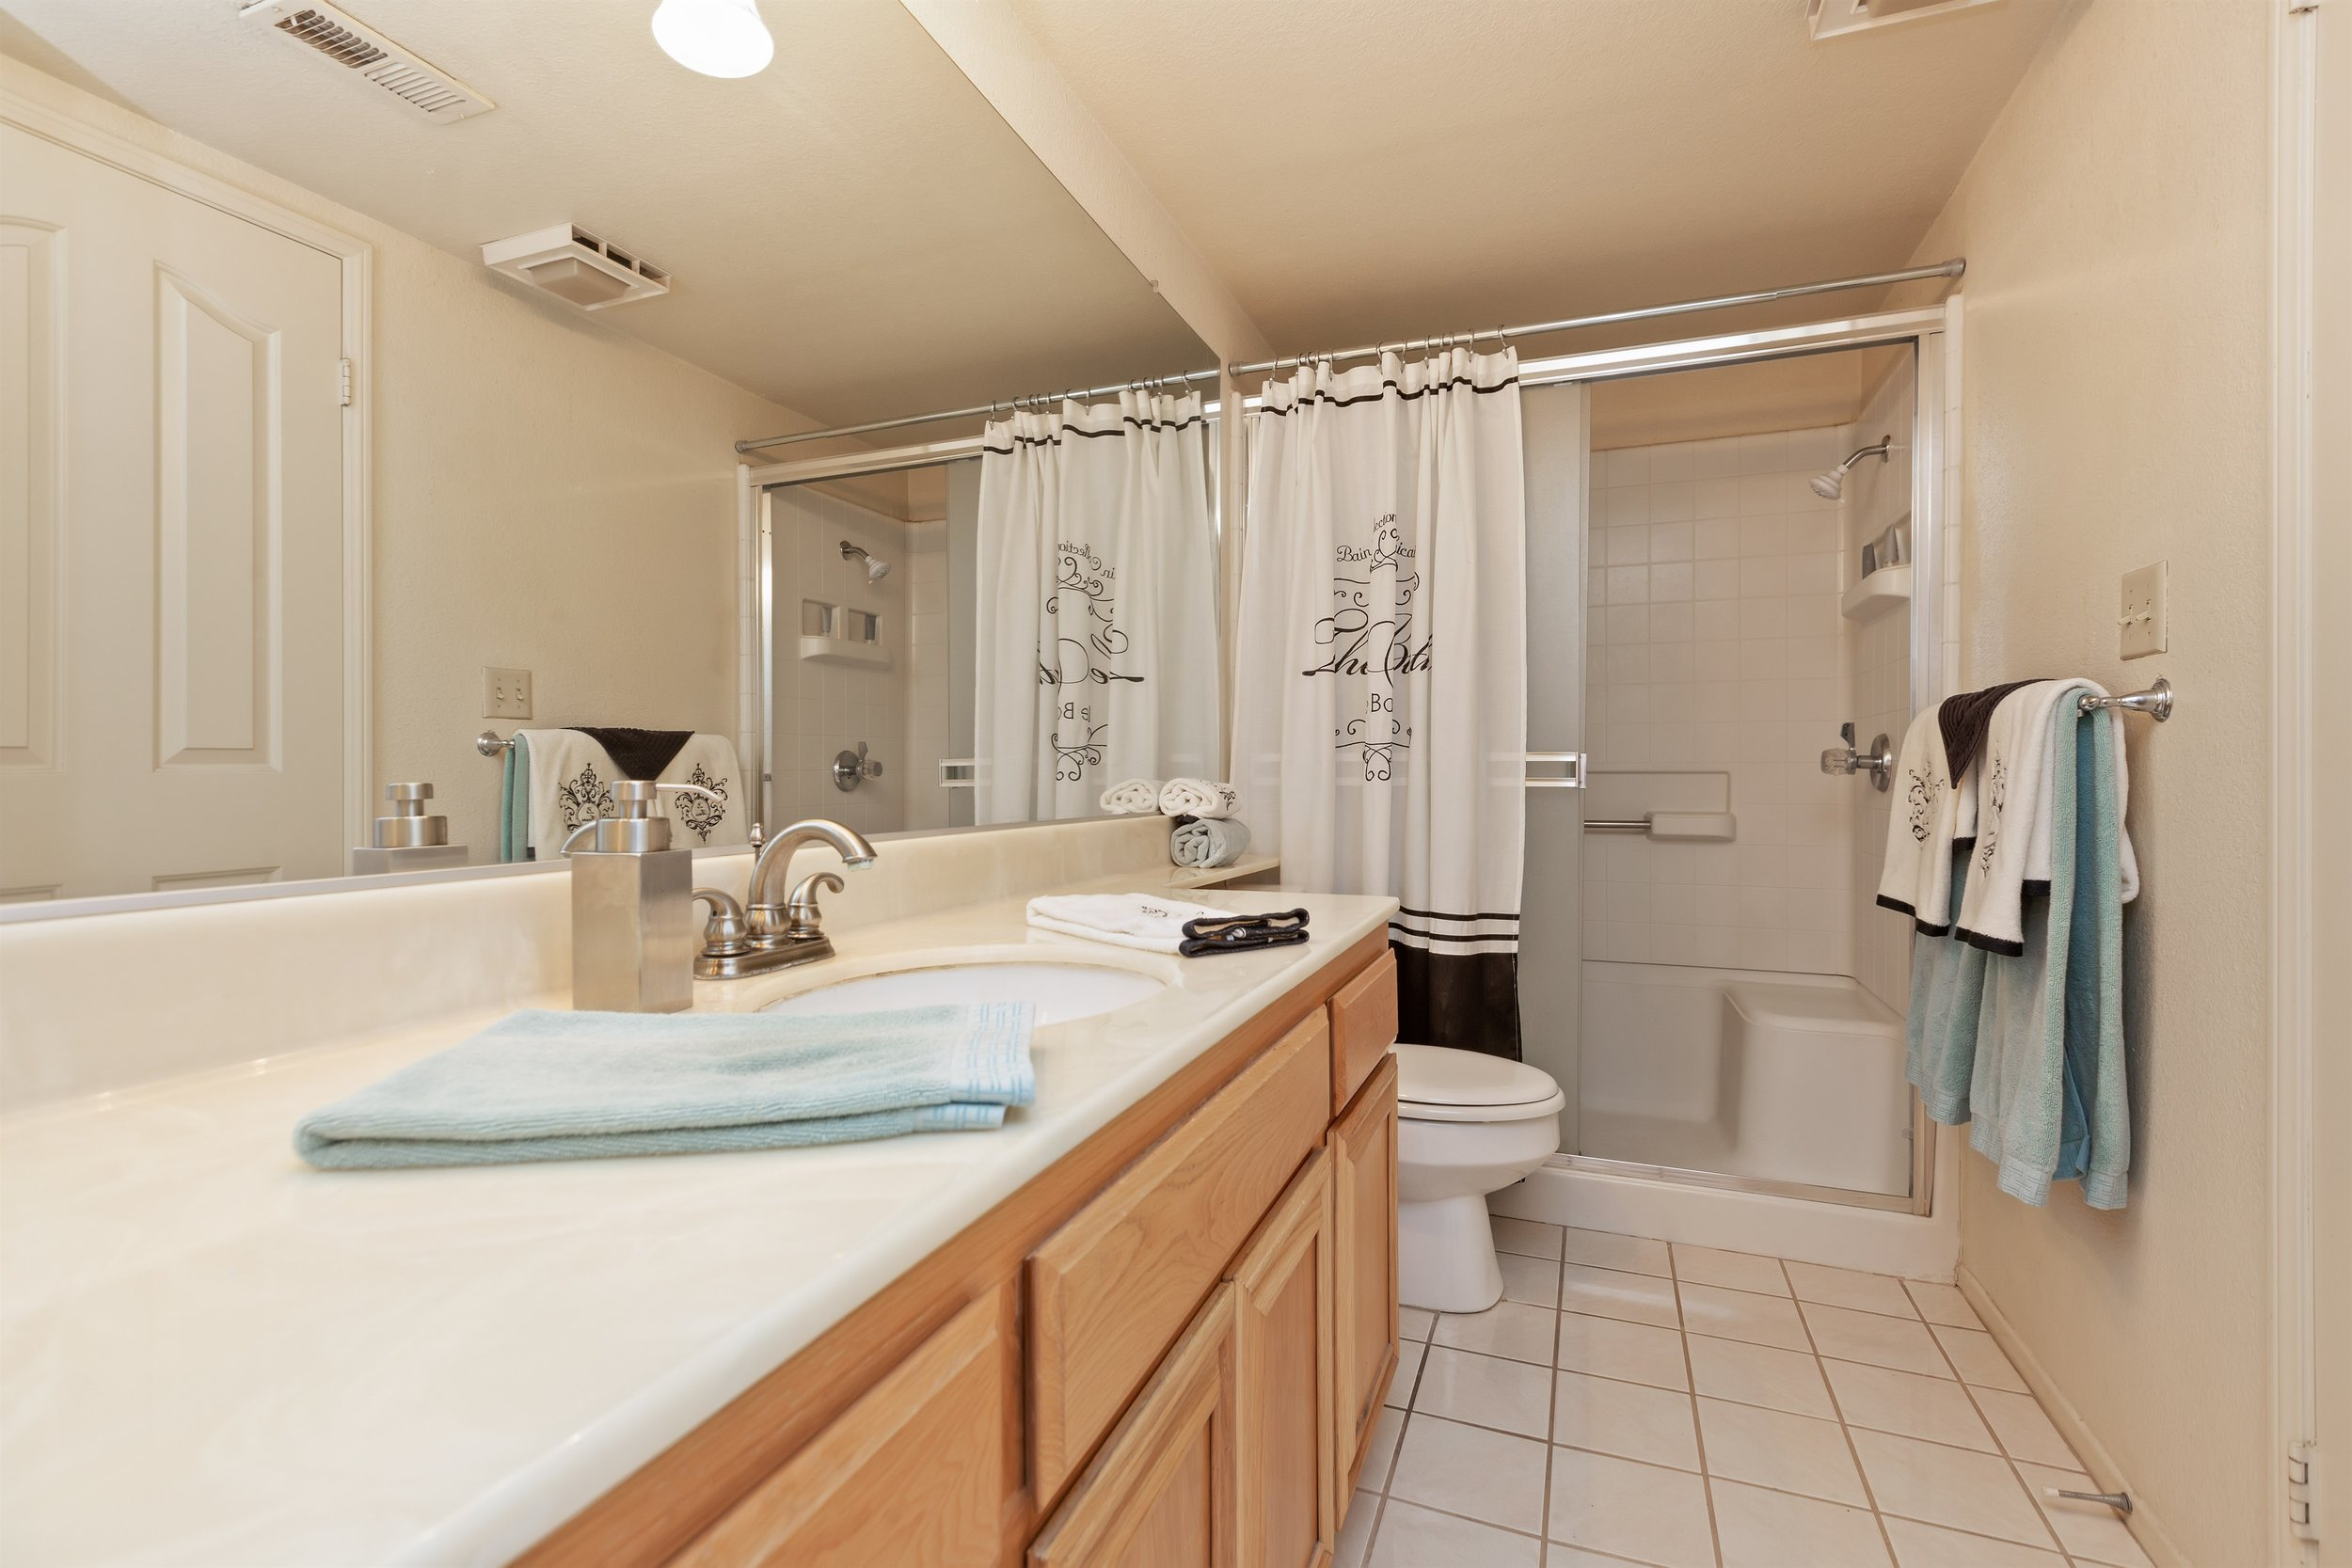 022_Bathroom .jpg